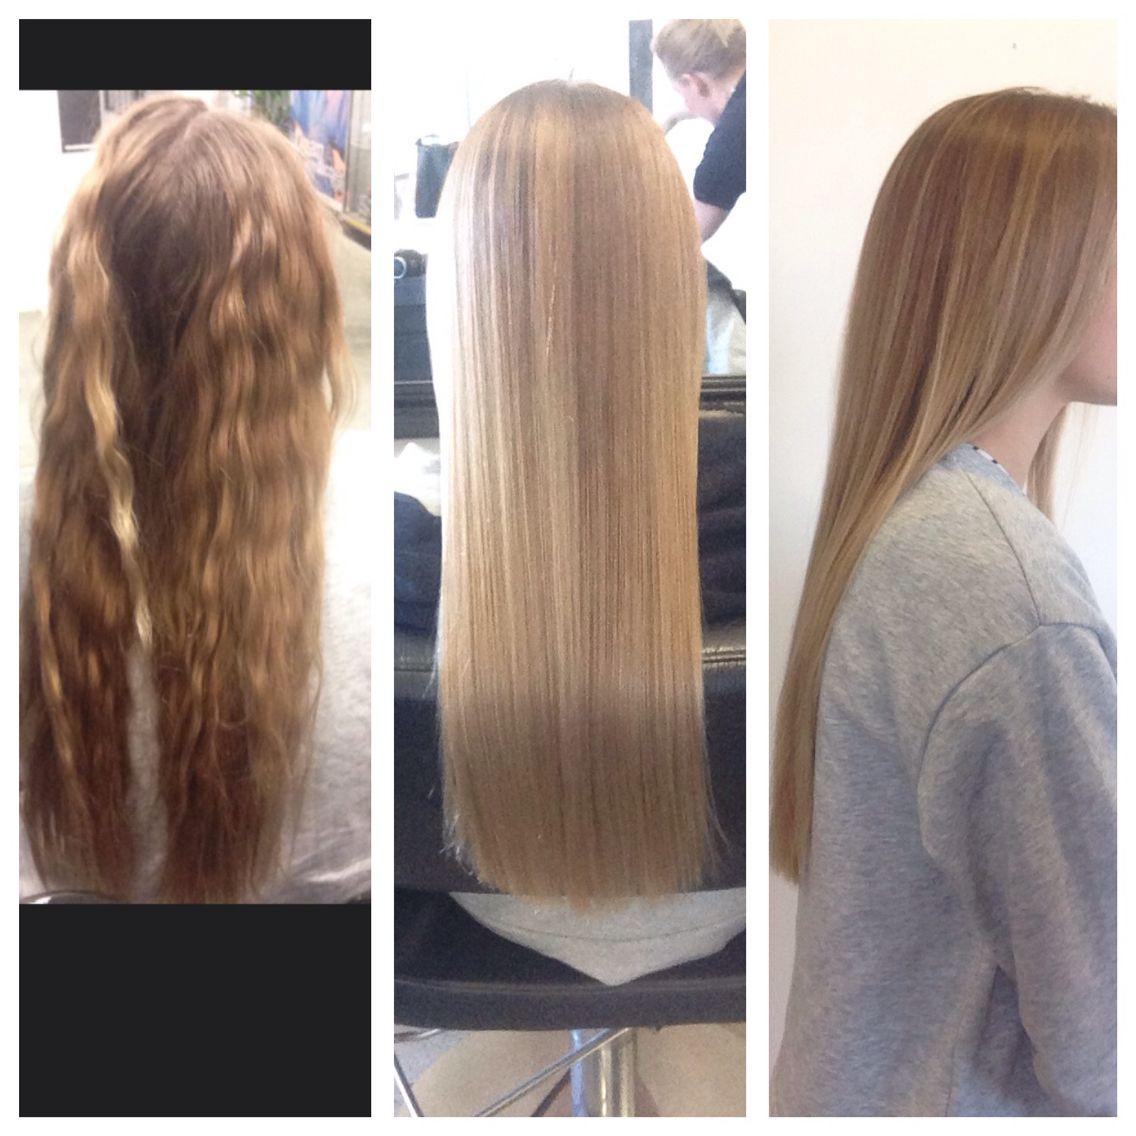 Long hair blow dry